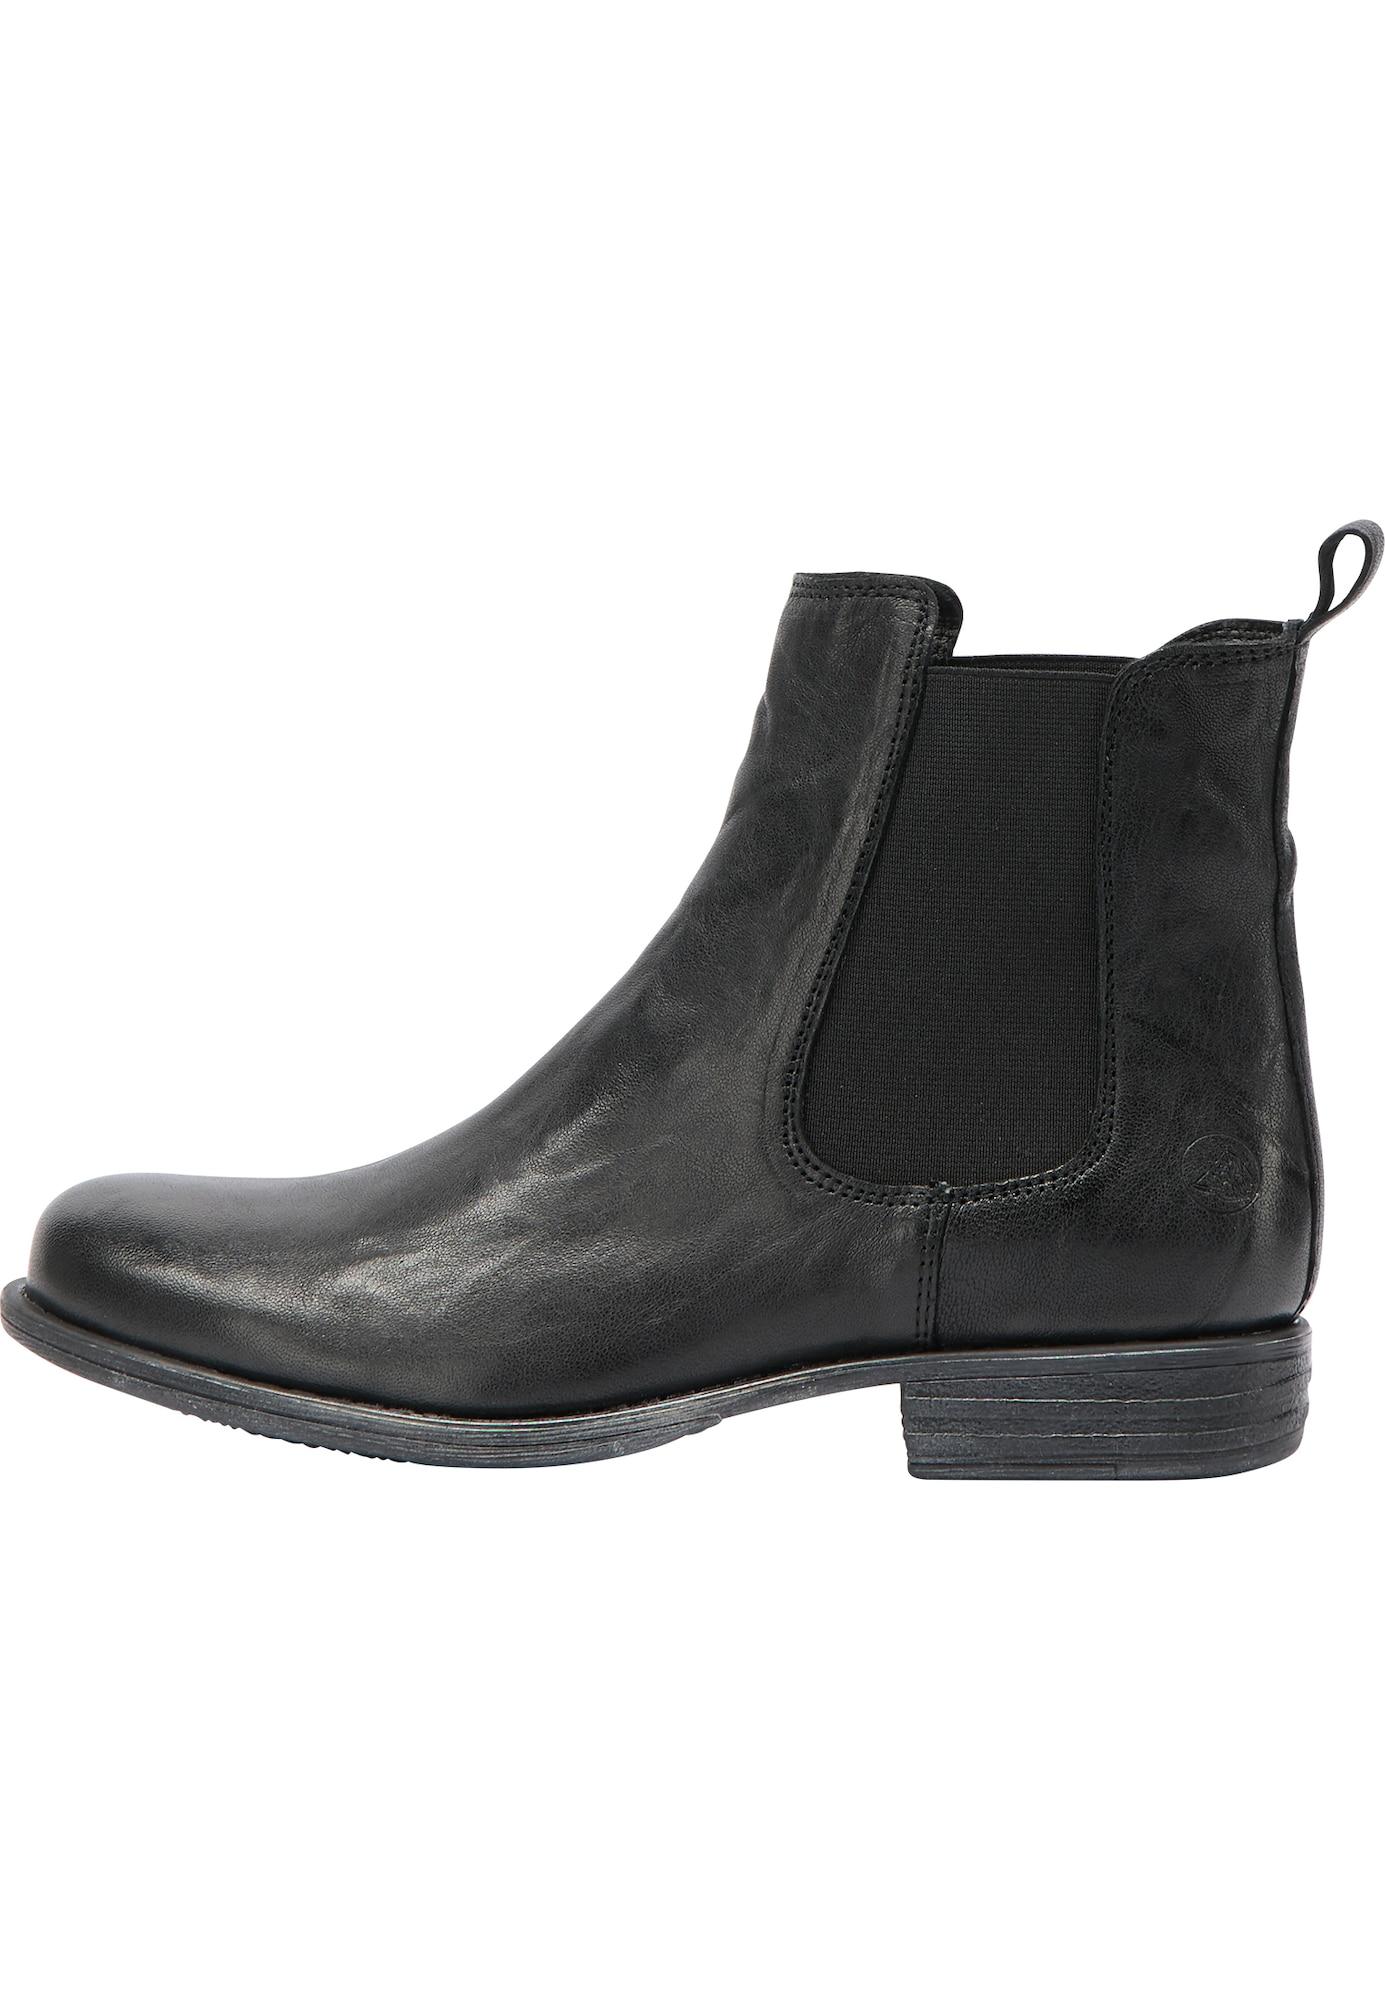 dreimaster vintage - Chelsea-Boot